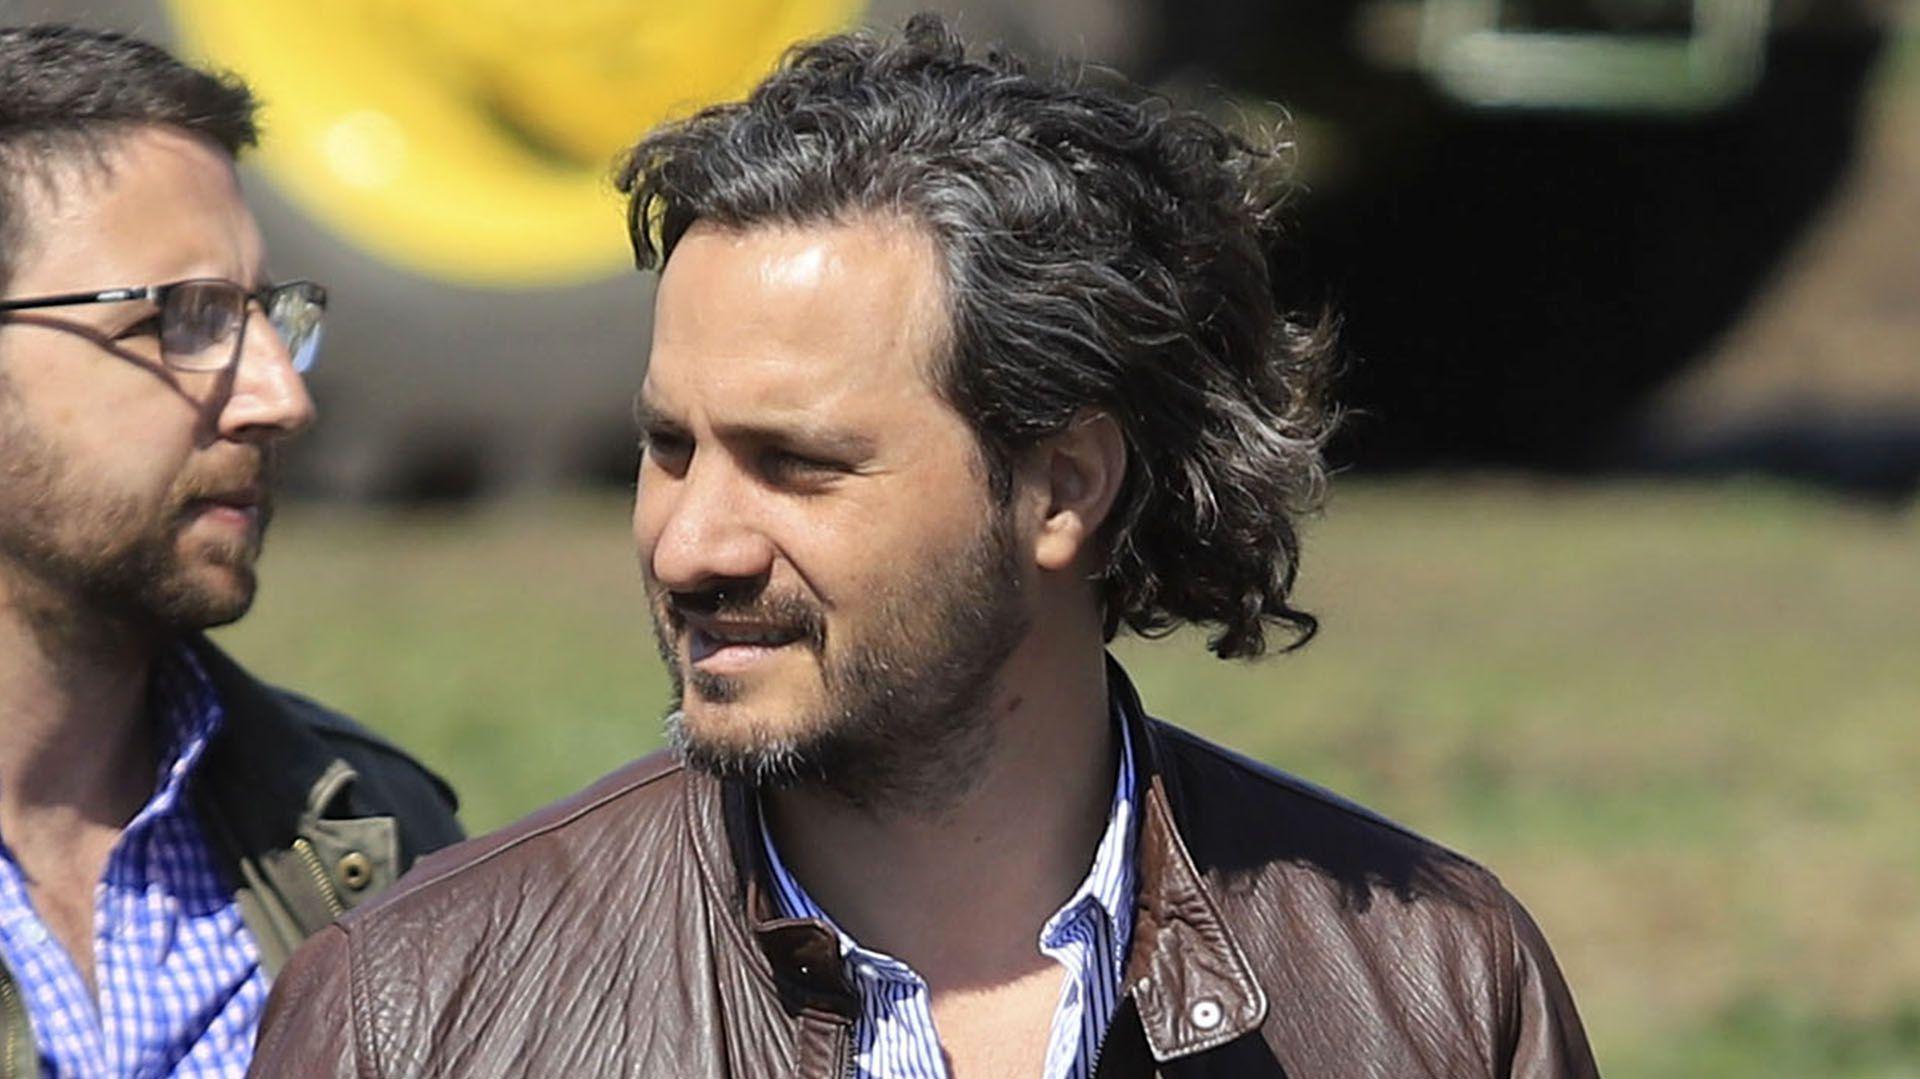 Santiago Cafiero (Foto: NA)